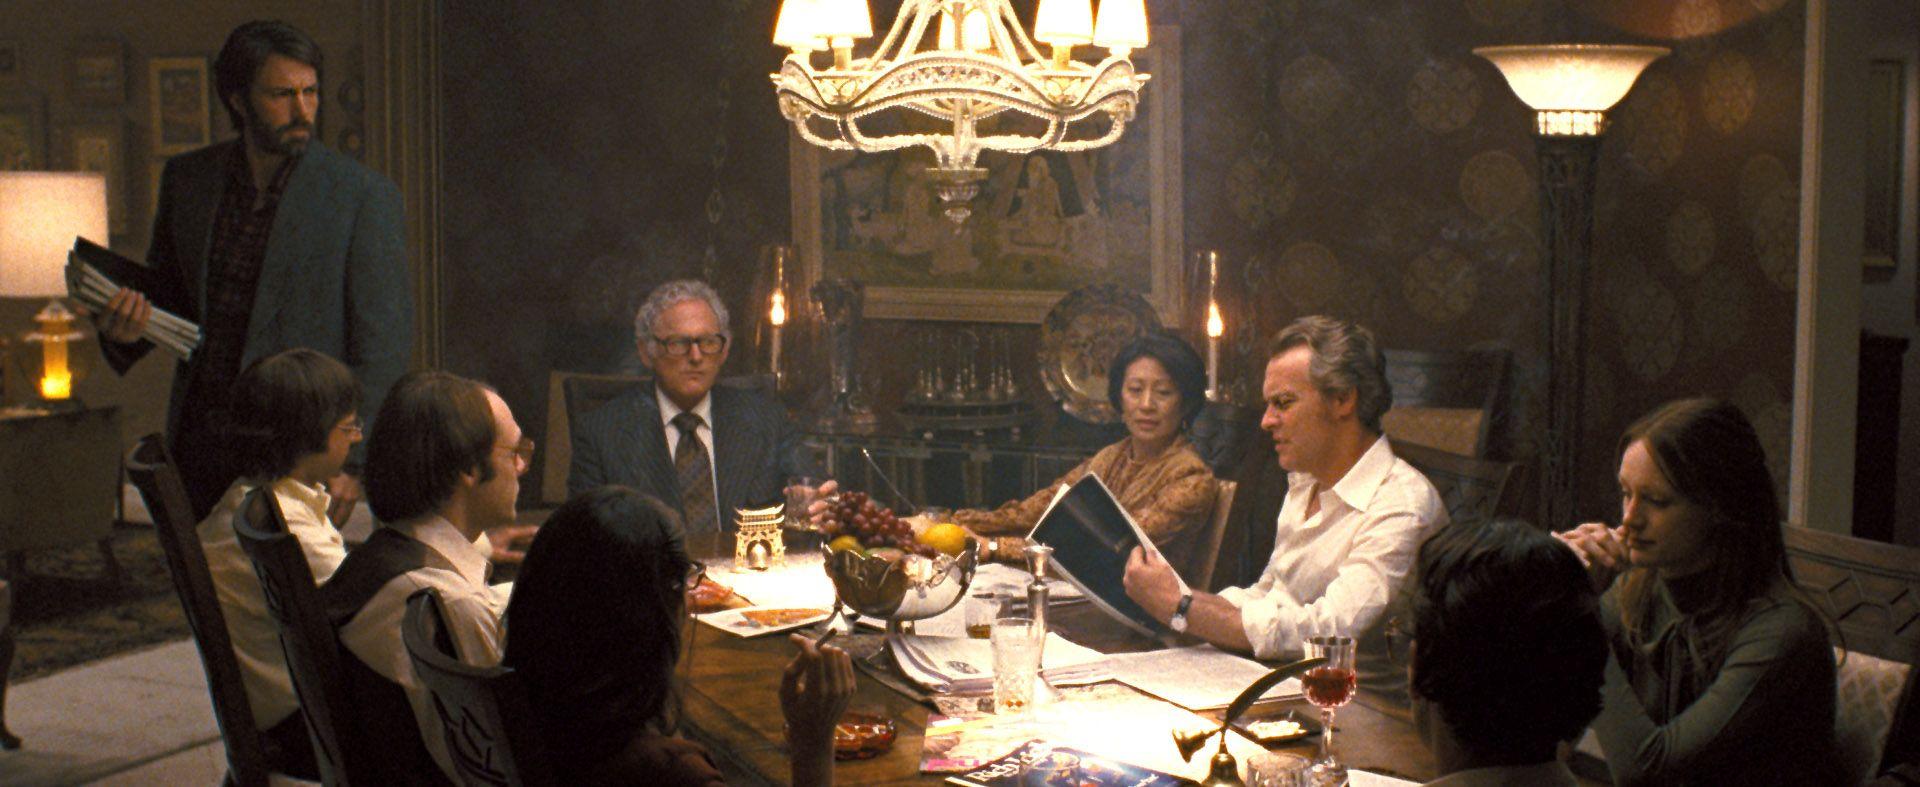 ARGO Images Featuring Ben Affleck, John Goodman, and Bryan ... Victor Garber Argo